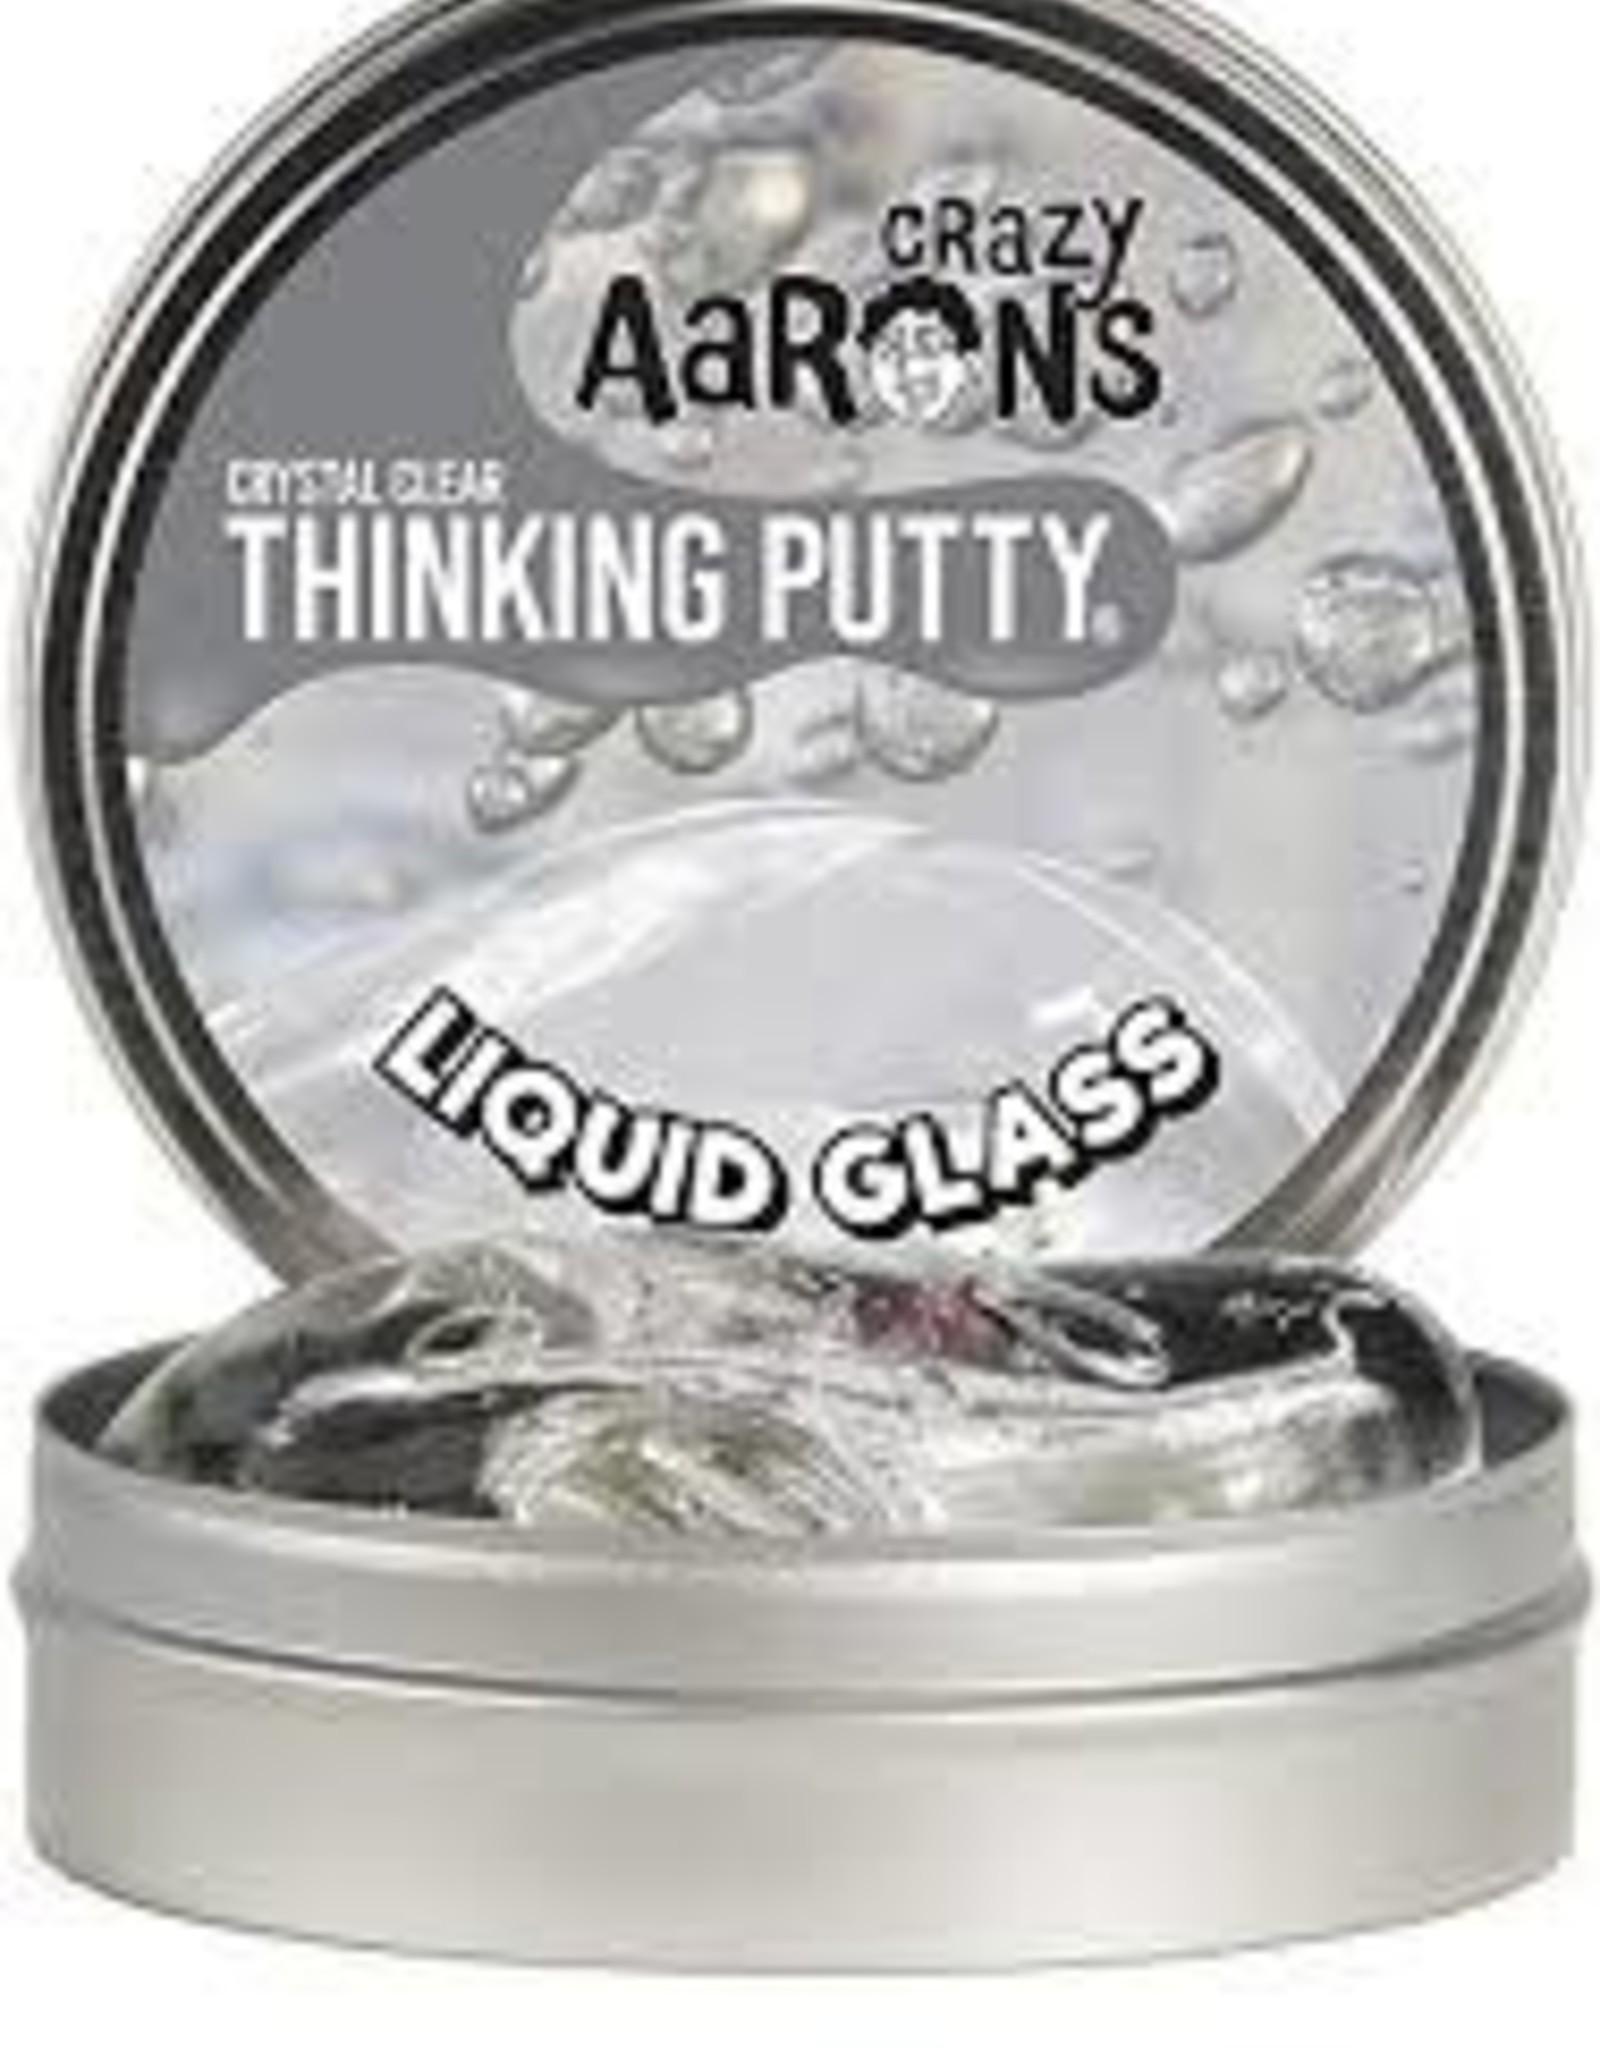 "Crazy Aaron's Thinking Putty Crazy Aaron's Liquid Glass 4"" Tins"